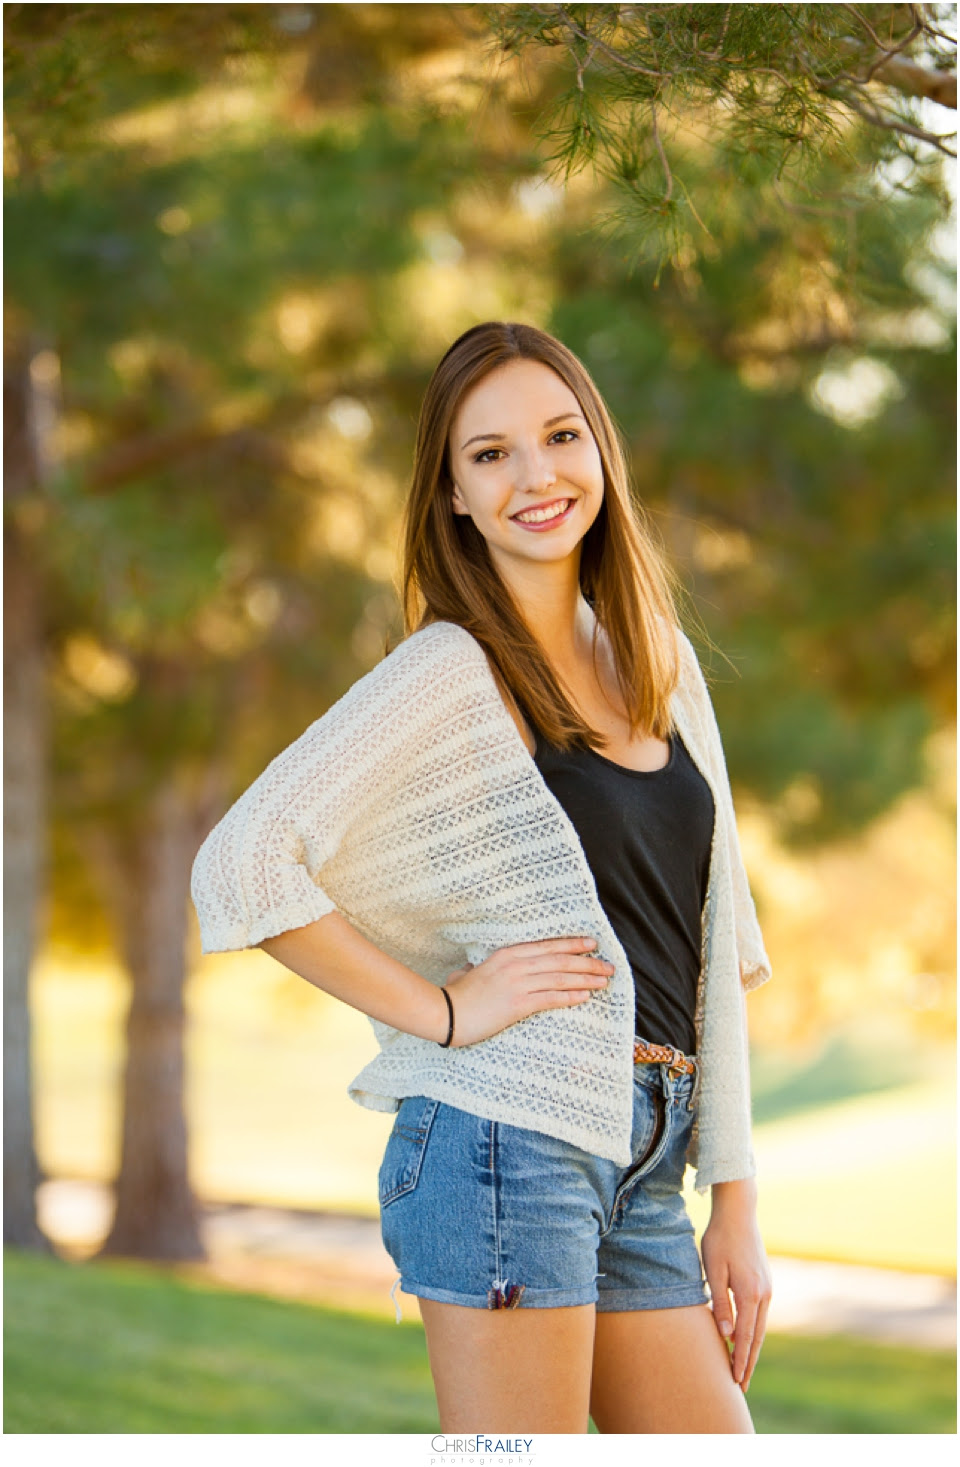 Haley   Outdoor Senior Portraits